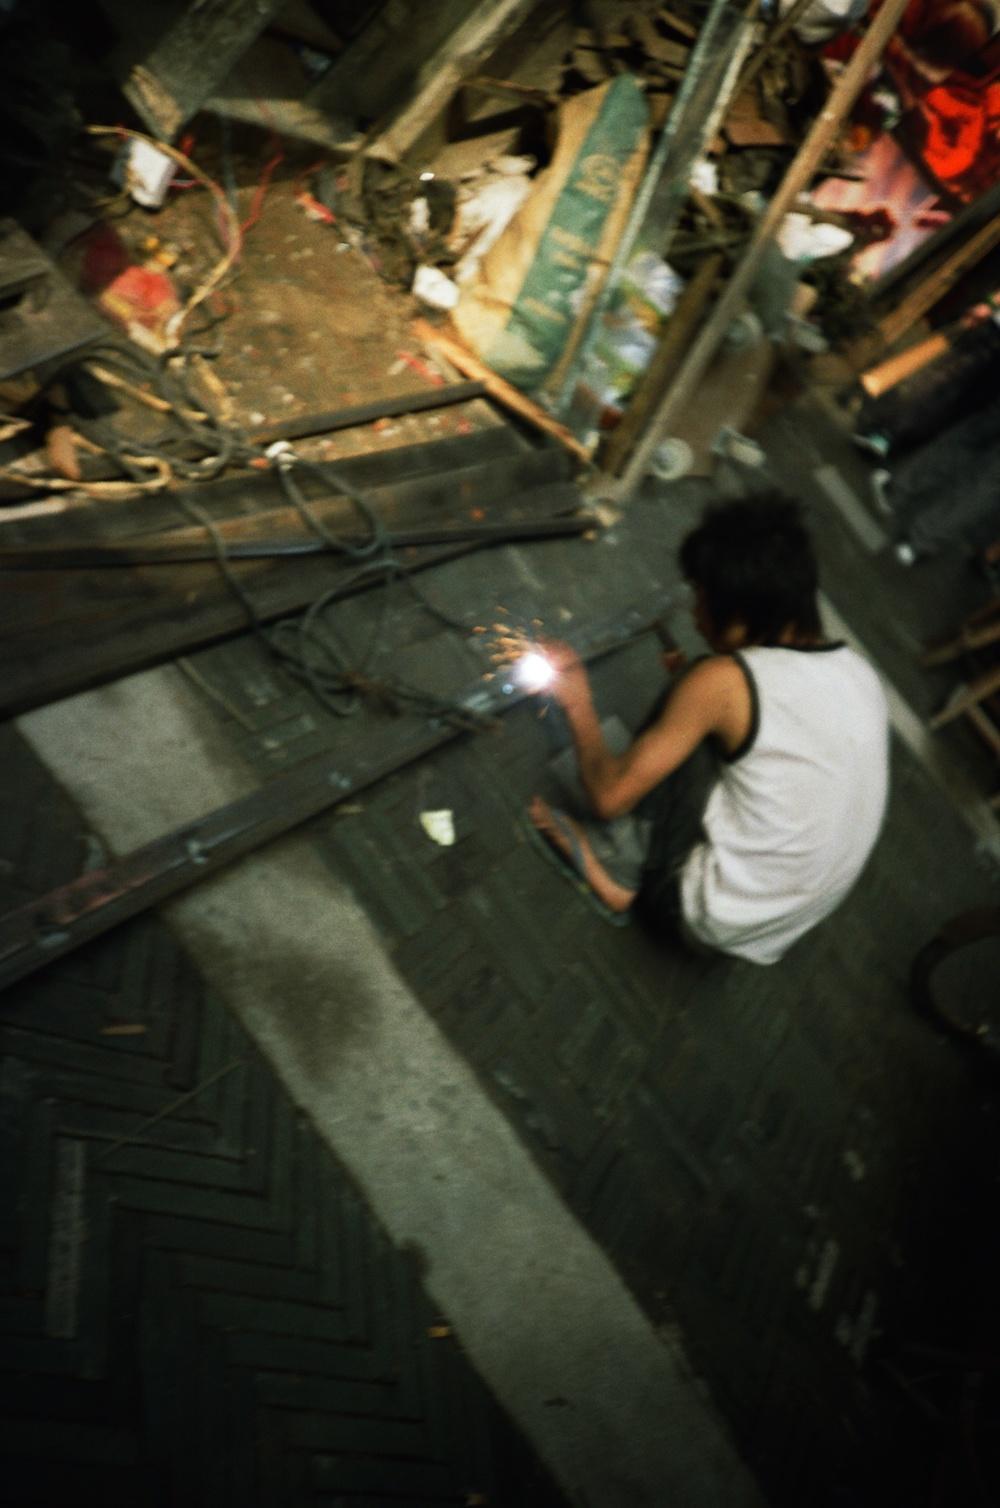 weldingInChina.jpg